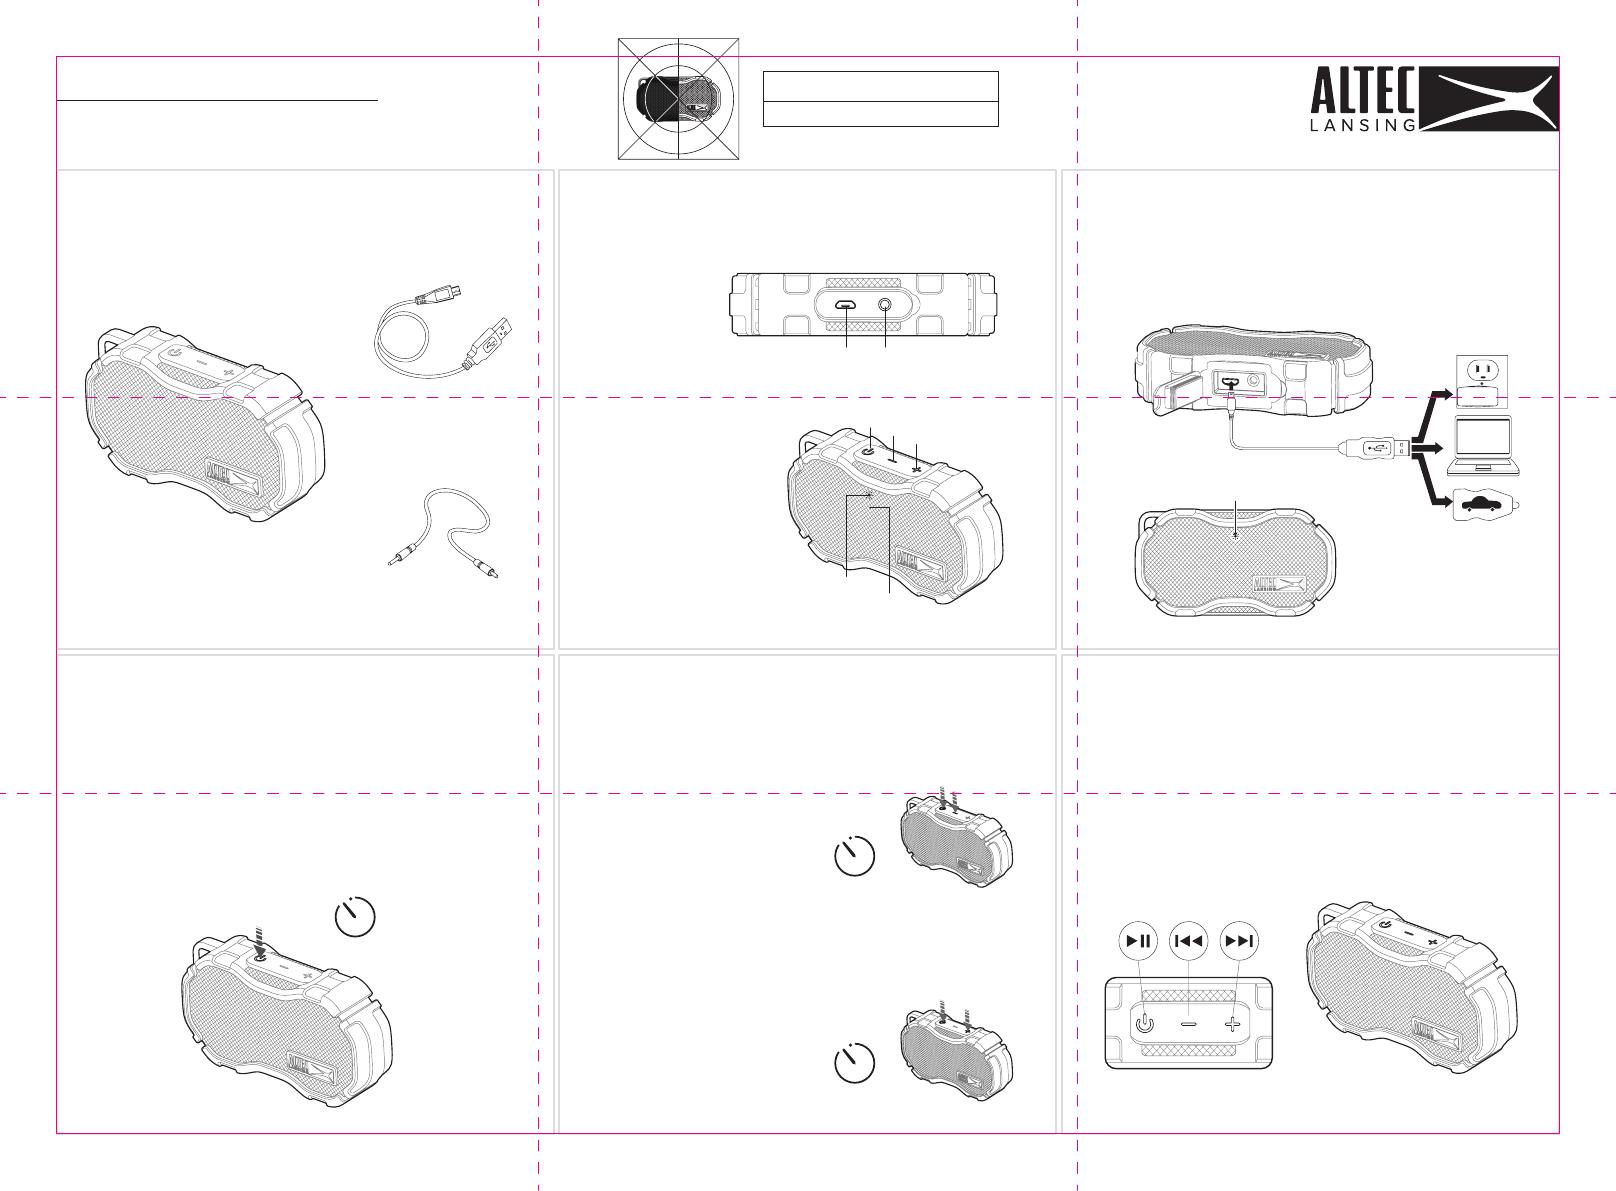 ATI Electronics IMW269 Bluetooth Speaker User Manual